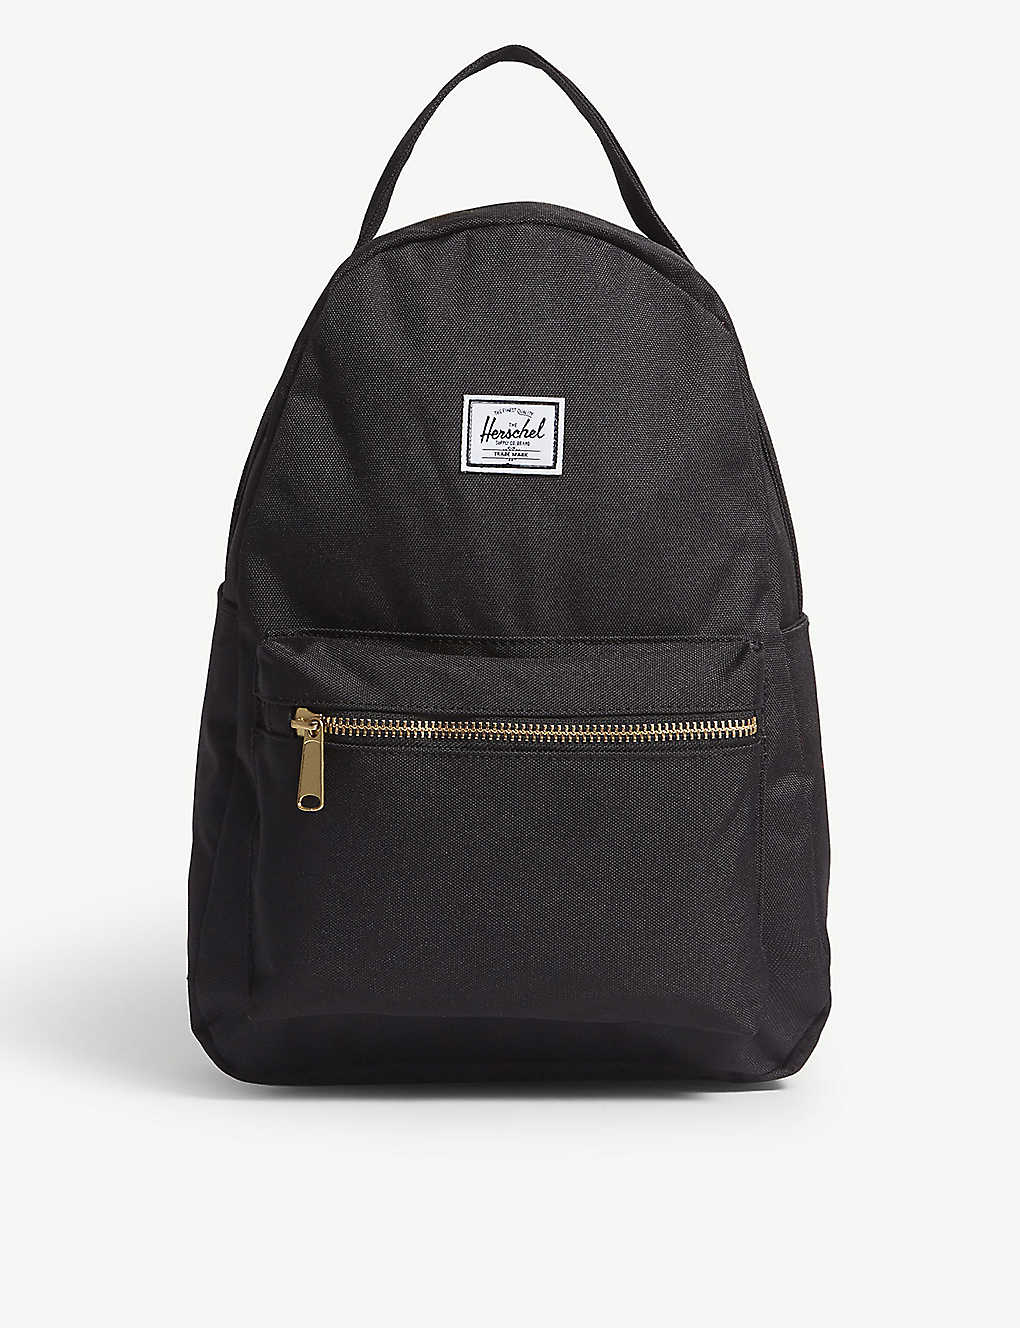 1ebd6281e21 HERSCHEL SUPPLY CO - Nova extra small backpack